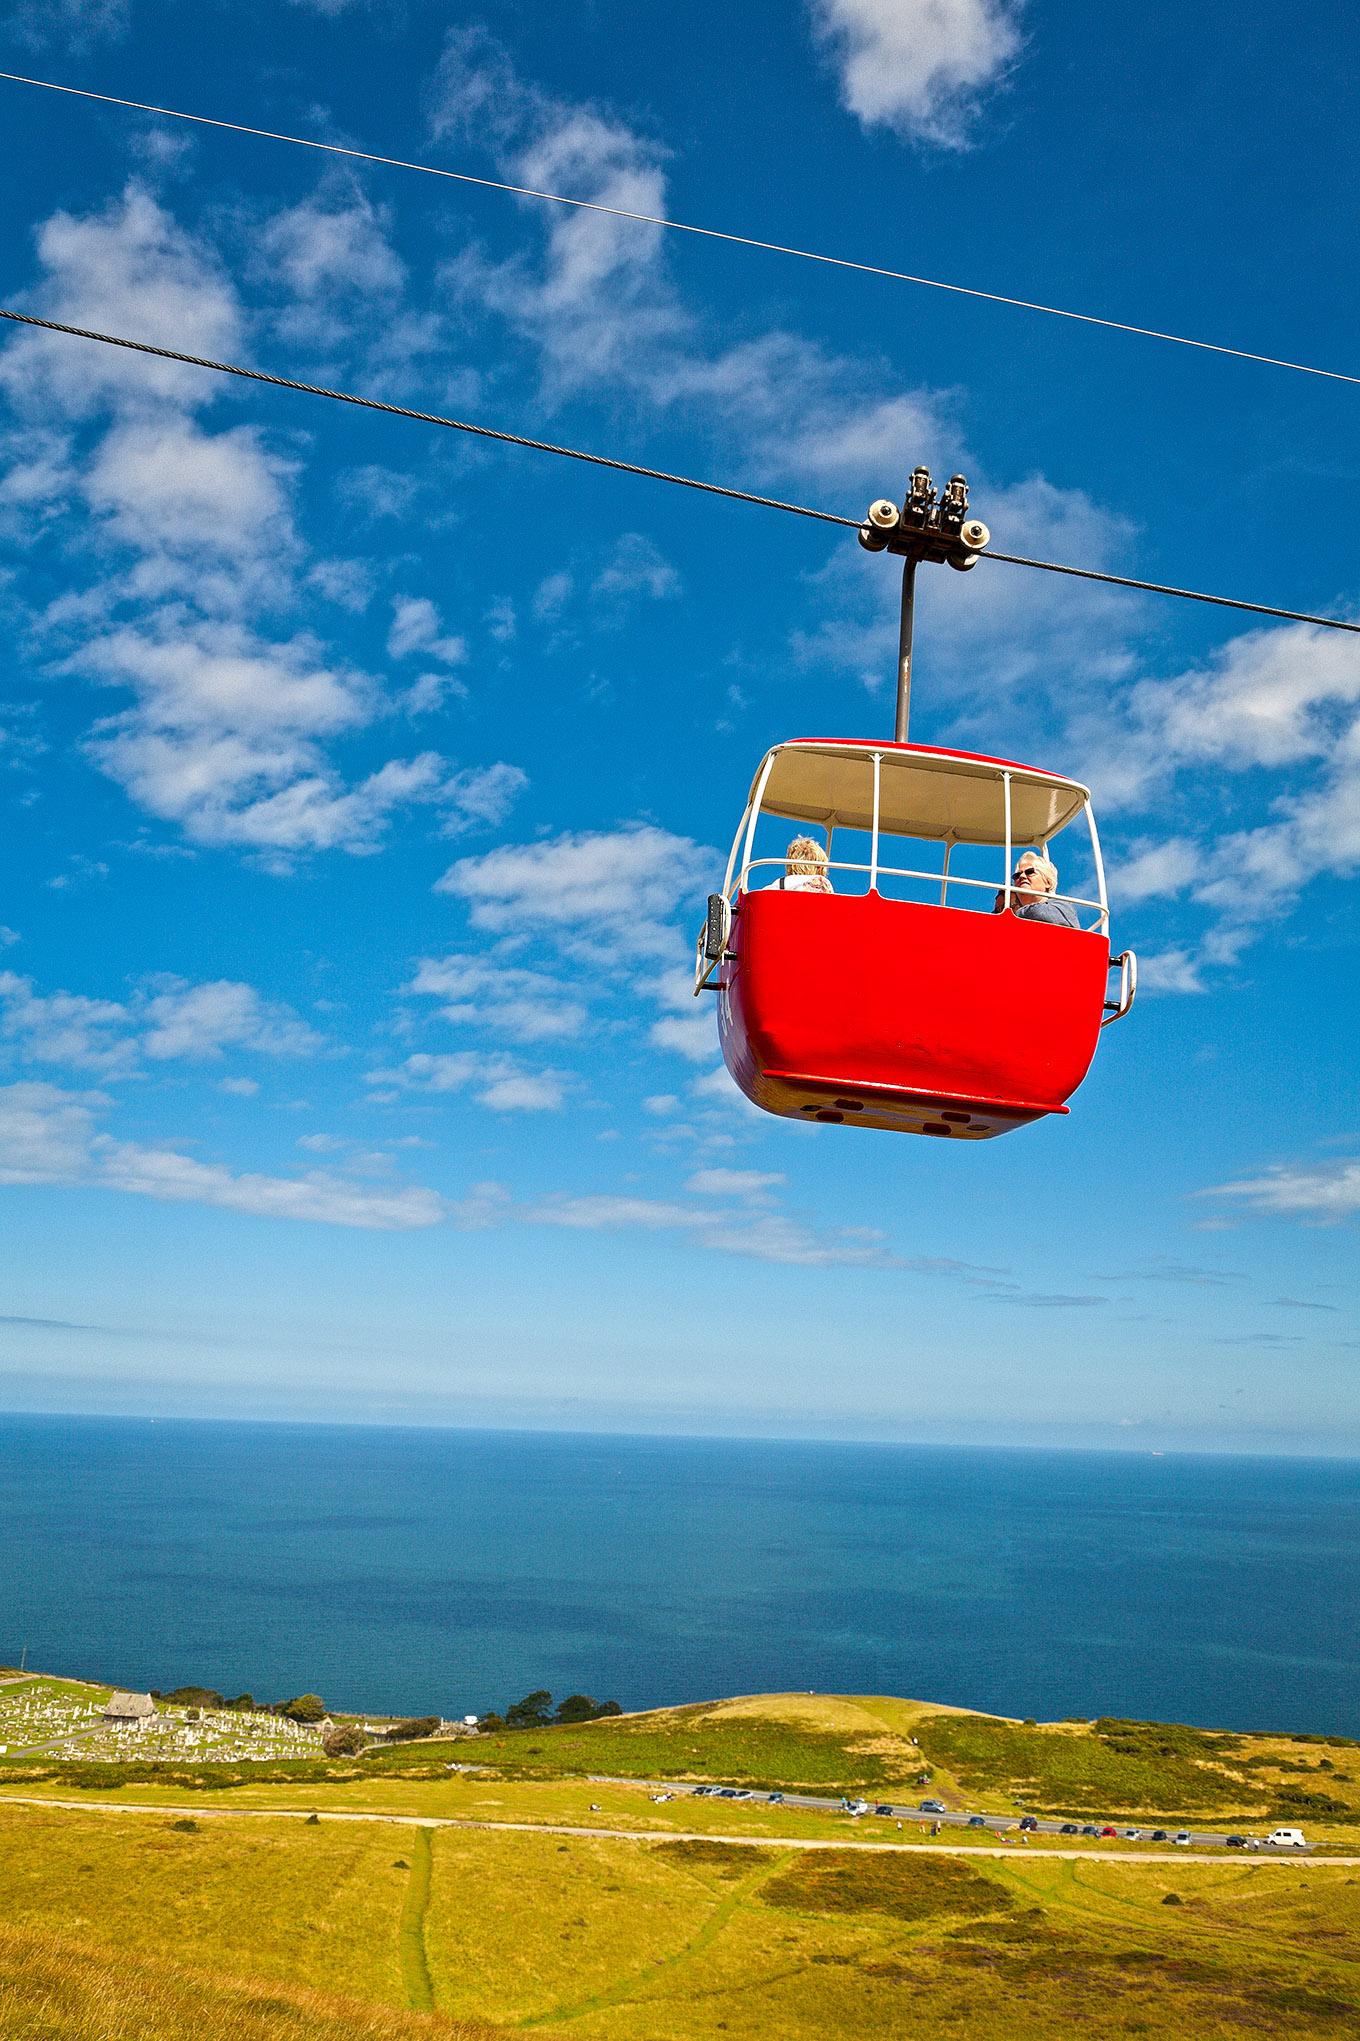 Red Cable Cab Great Orne Llandudno North Wales Coast